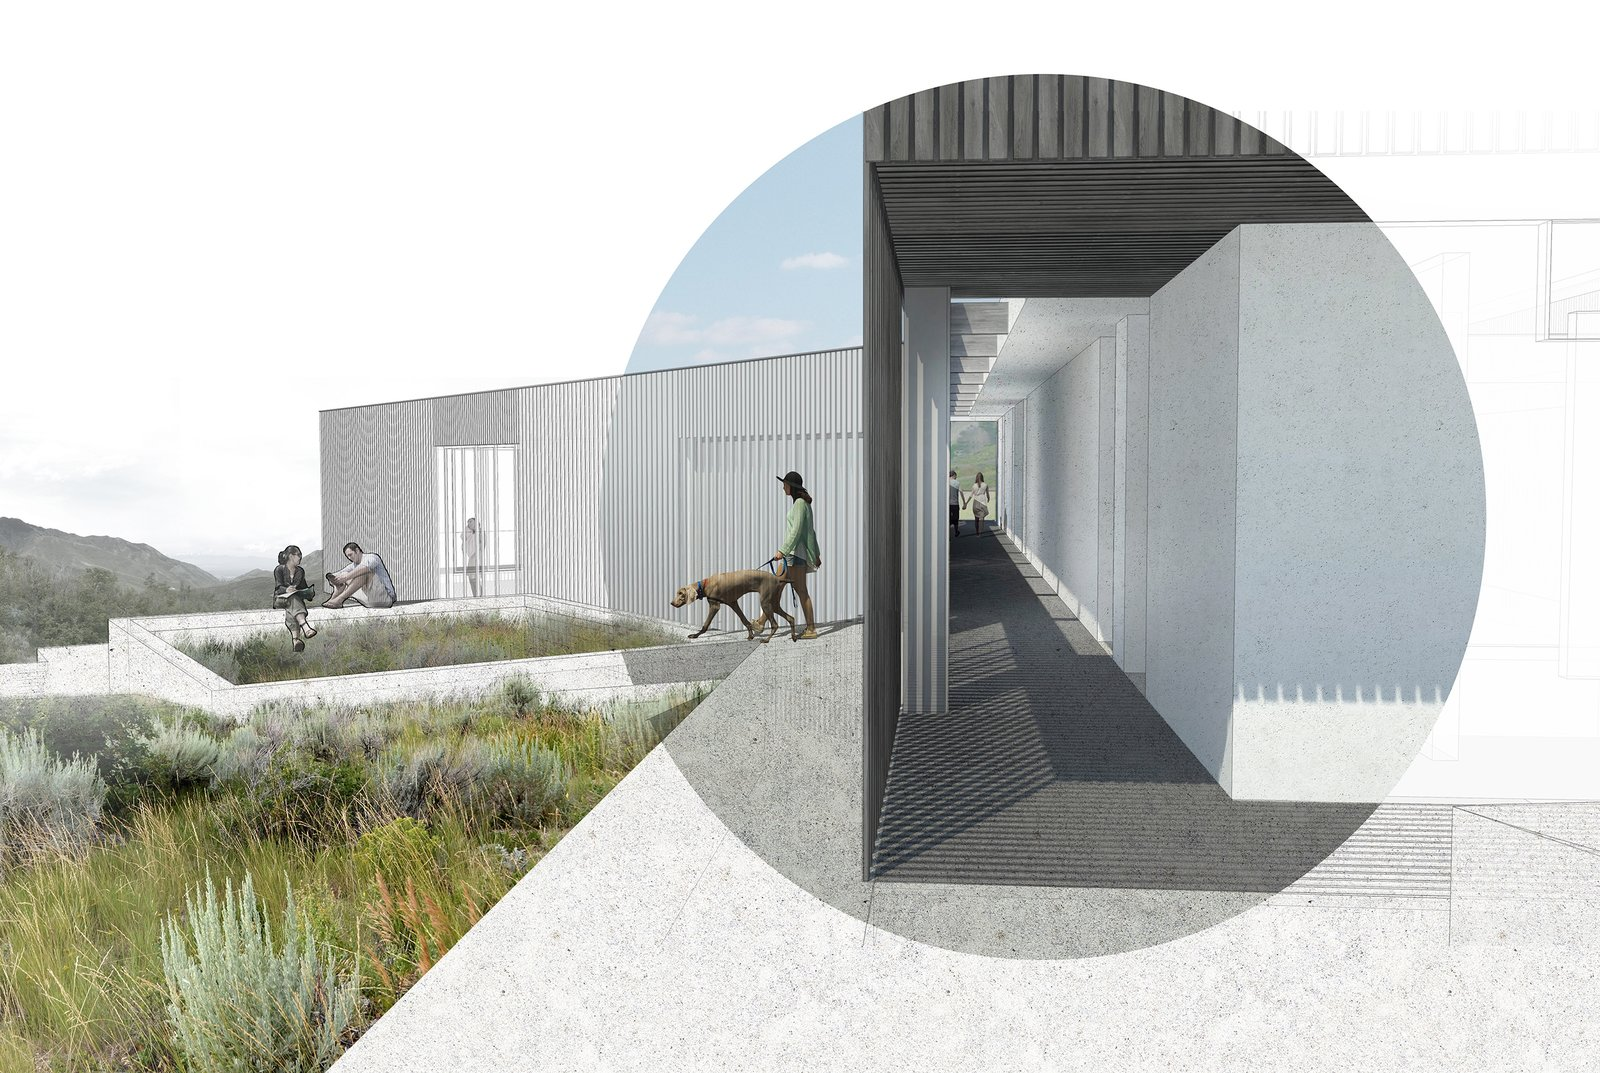 Wabi-Sabi House by Sparano + Mooney Architecture